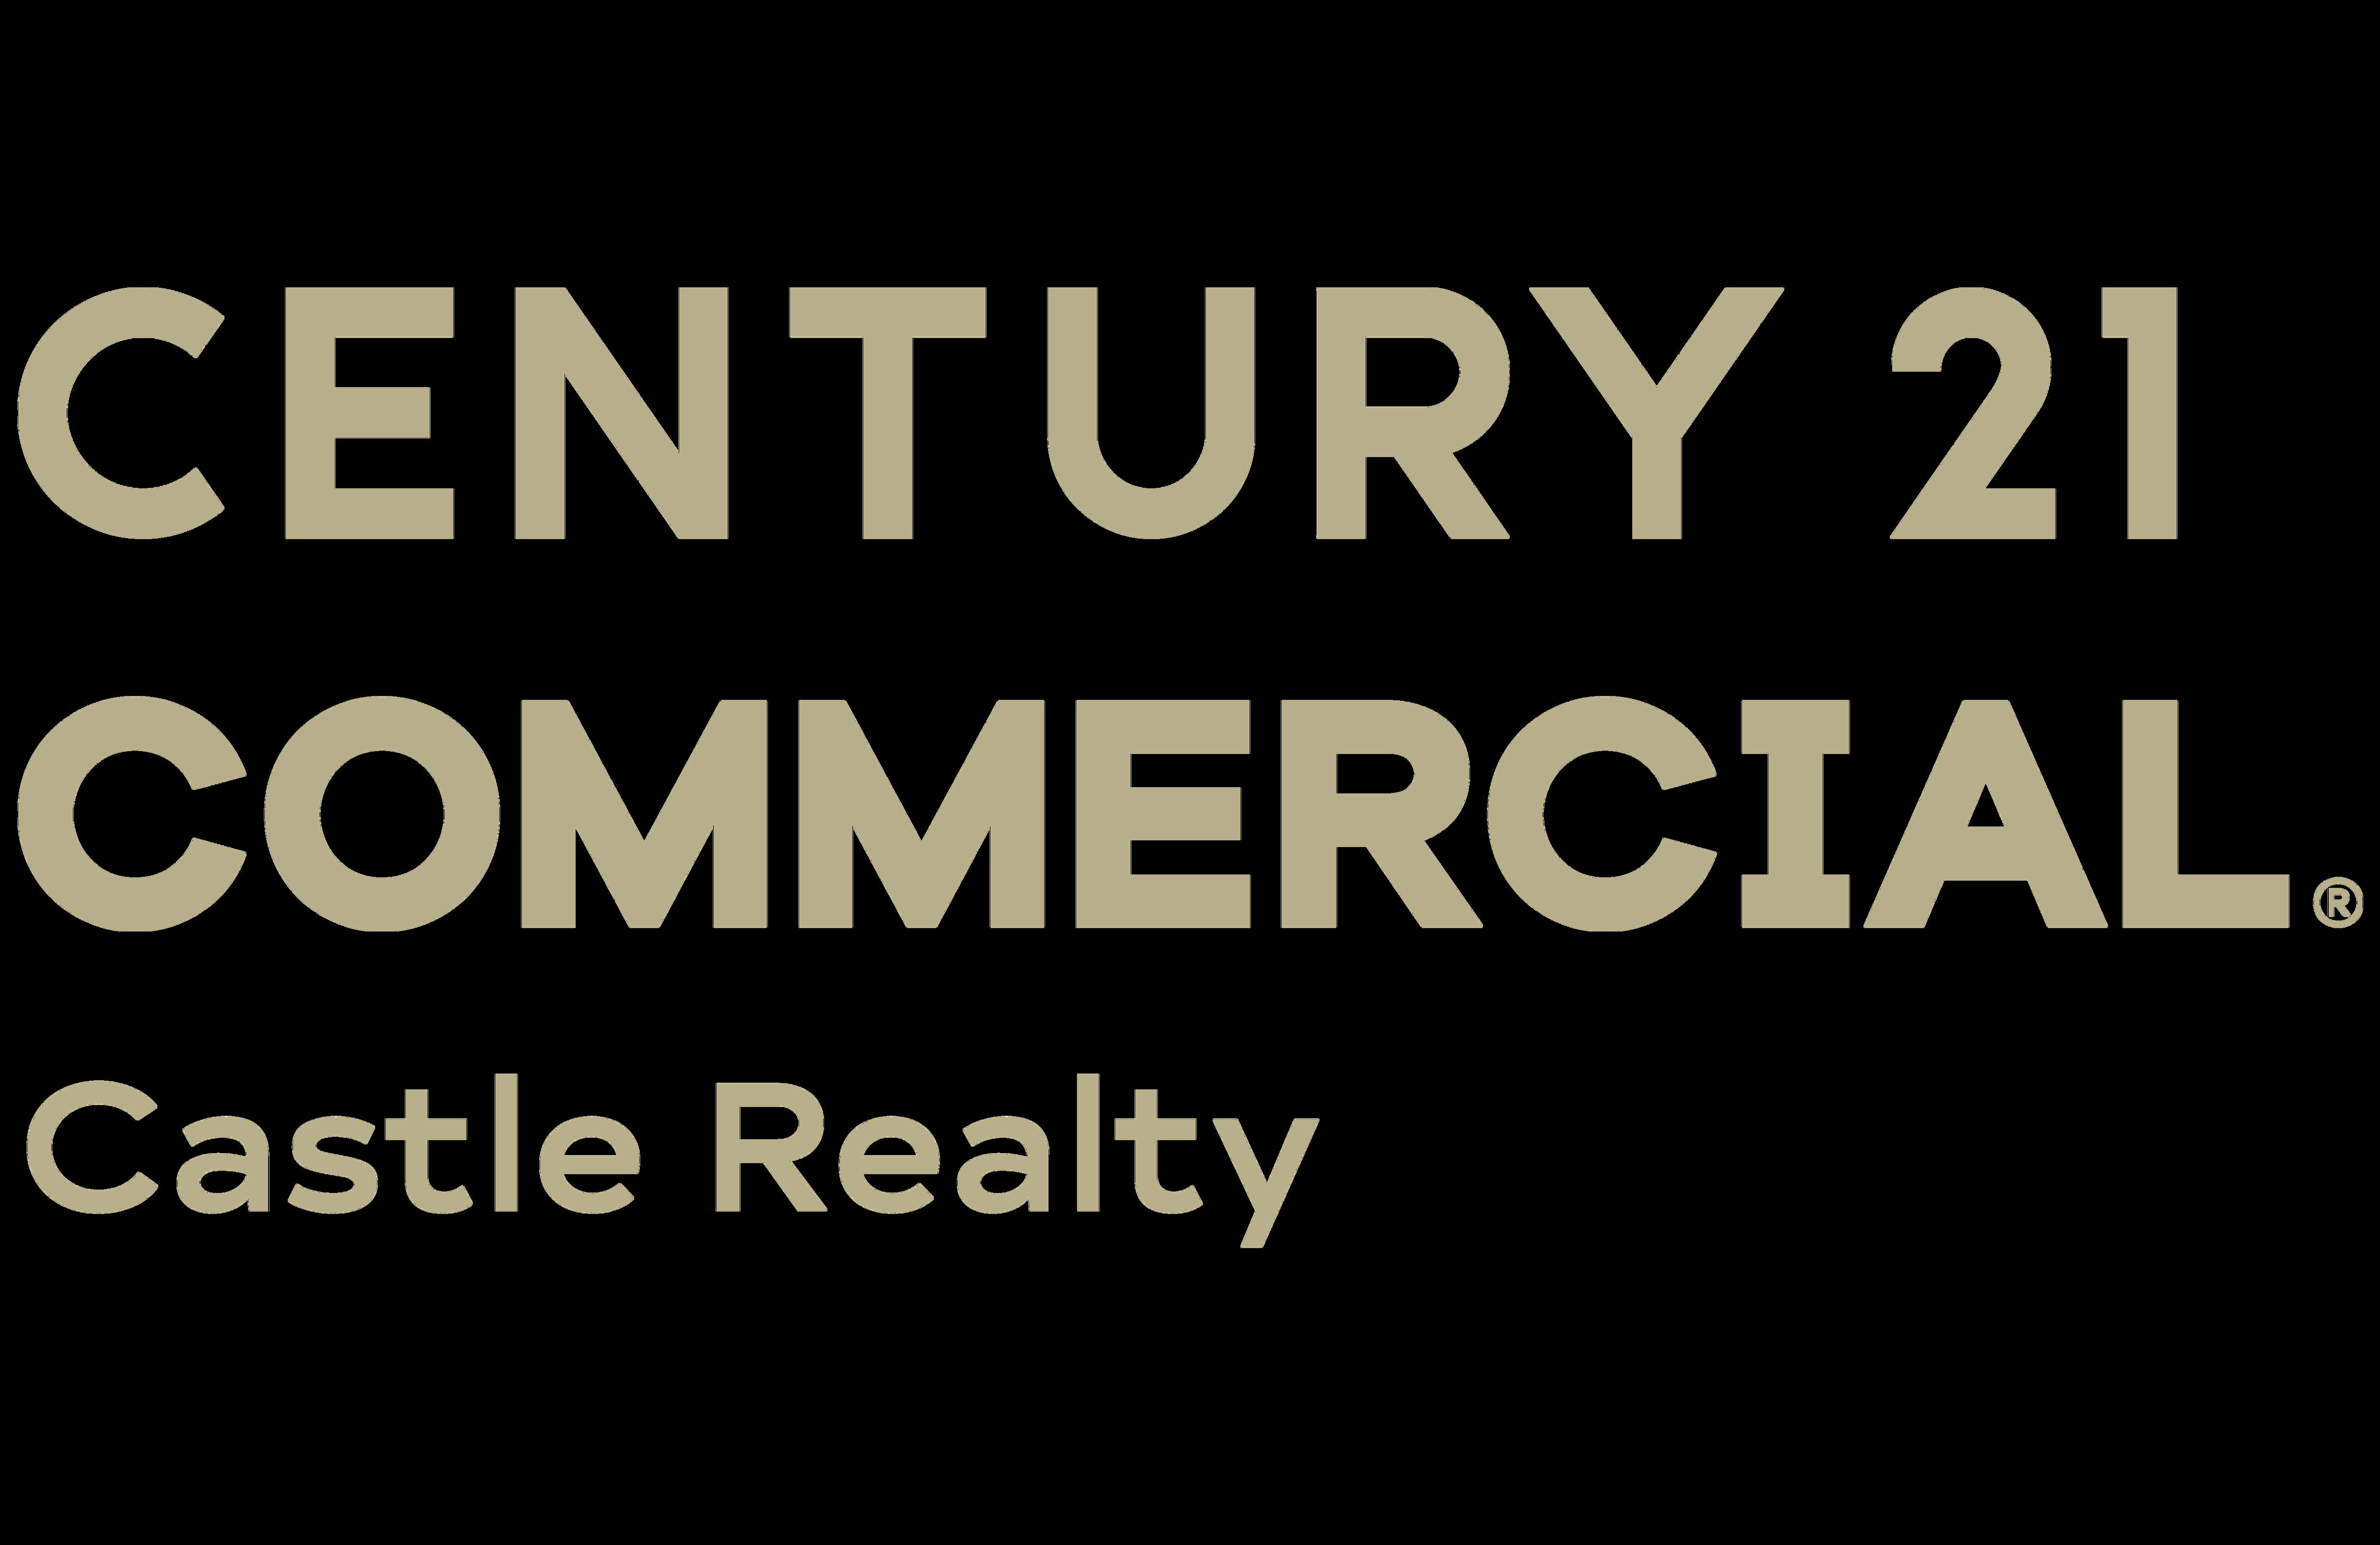 CENTURY 21 Castle Realty